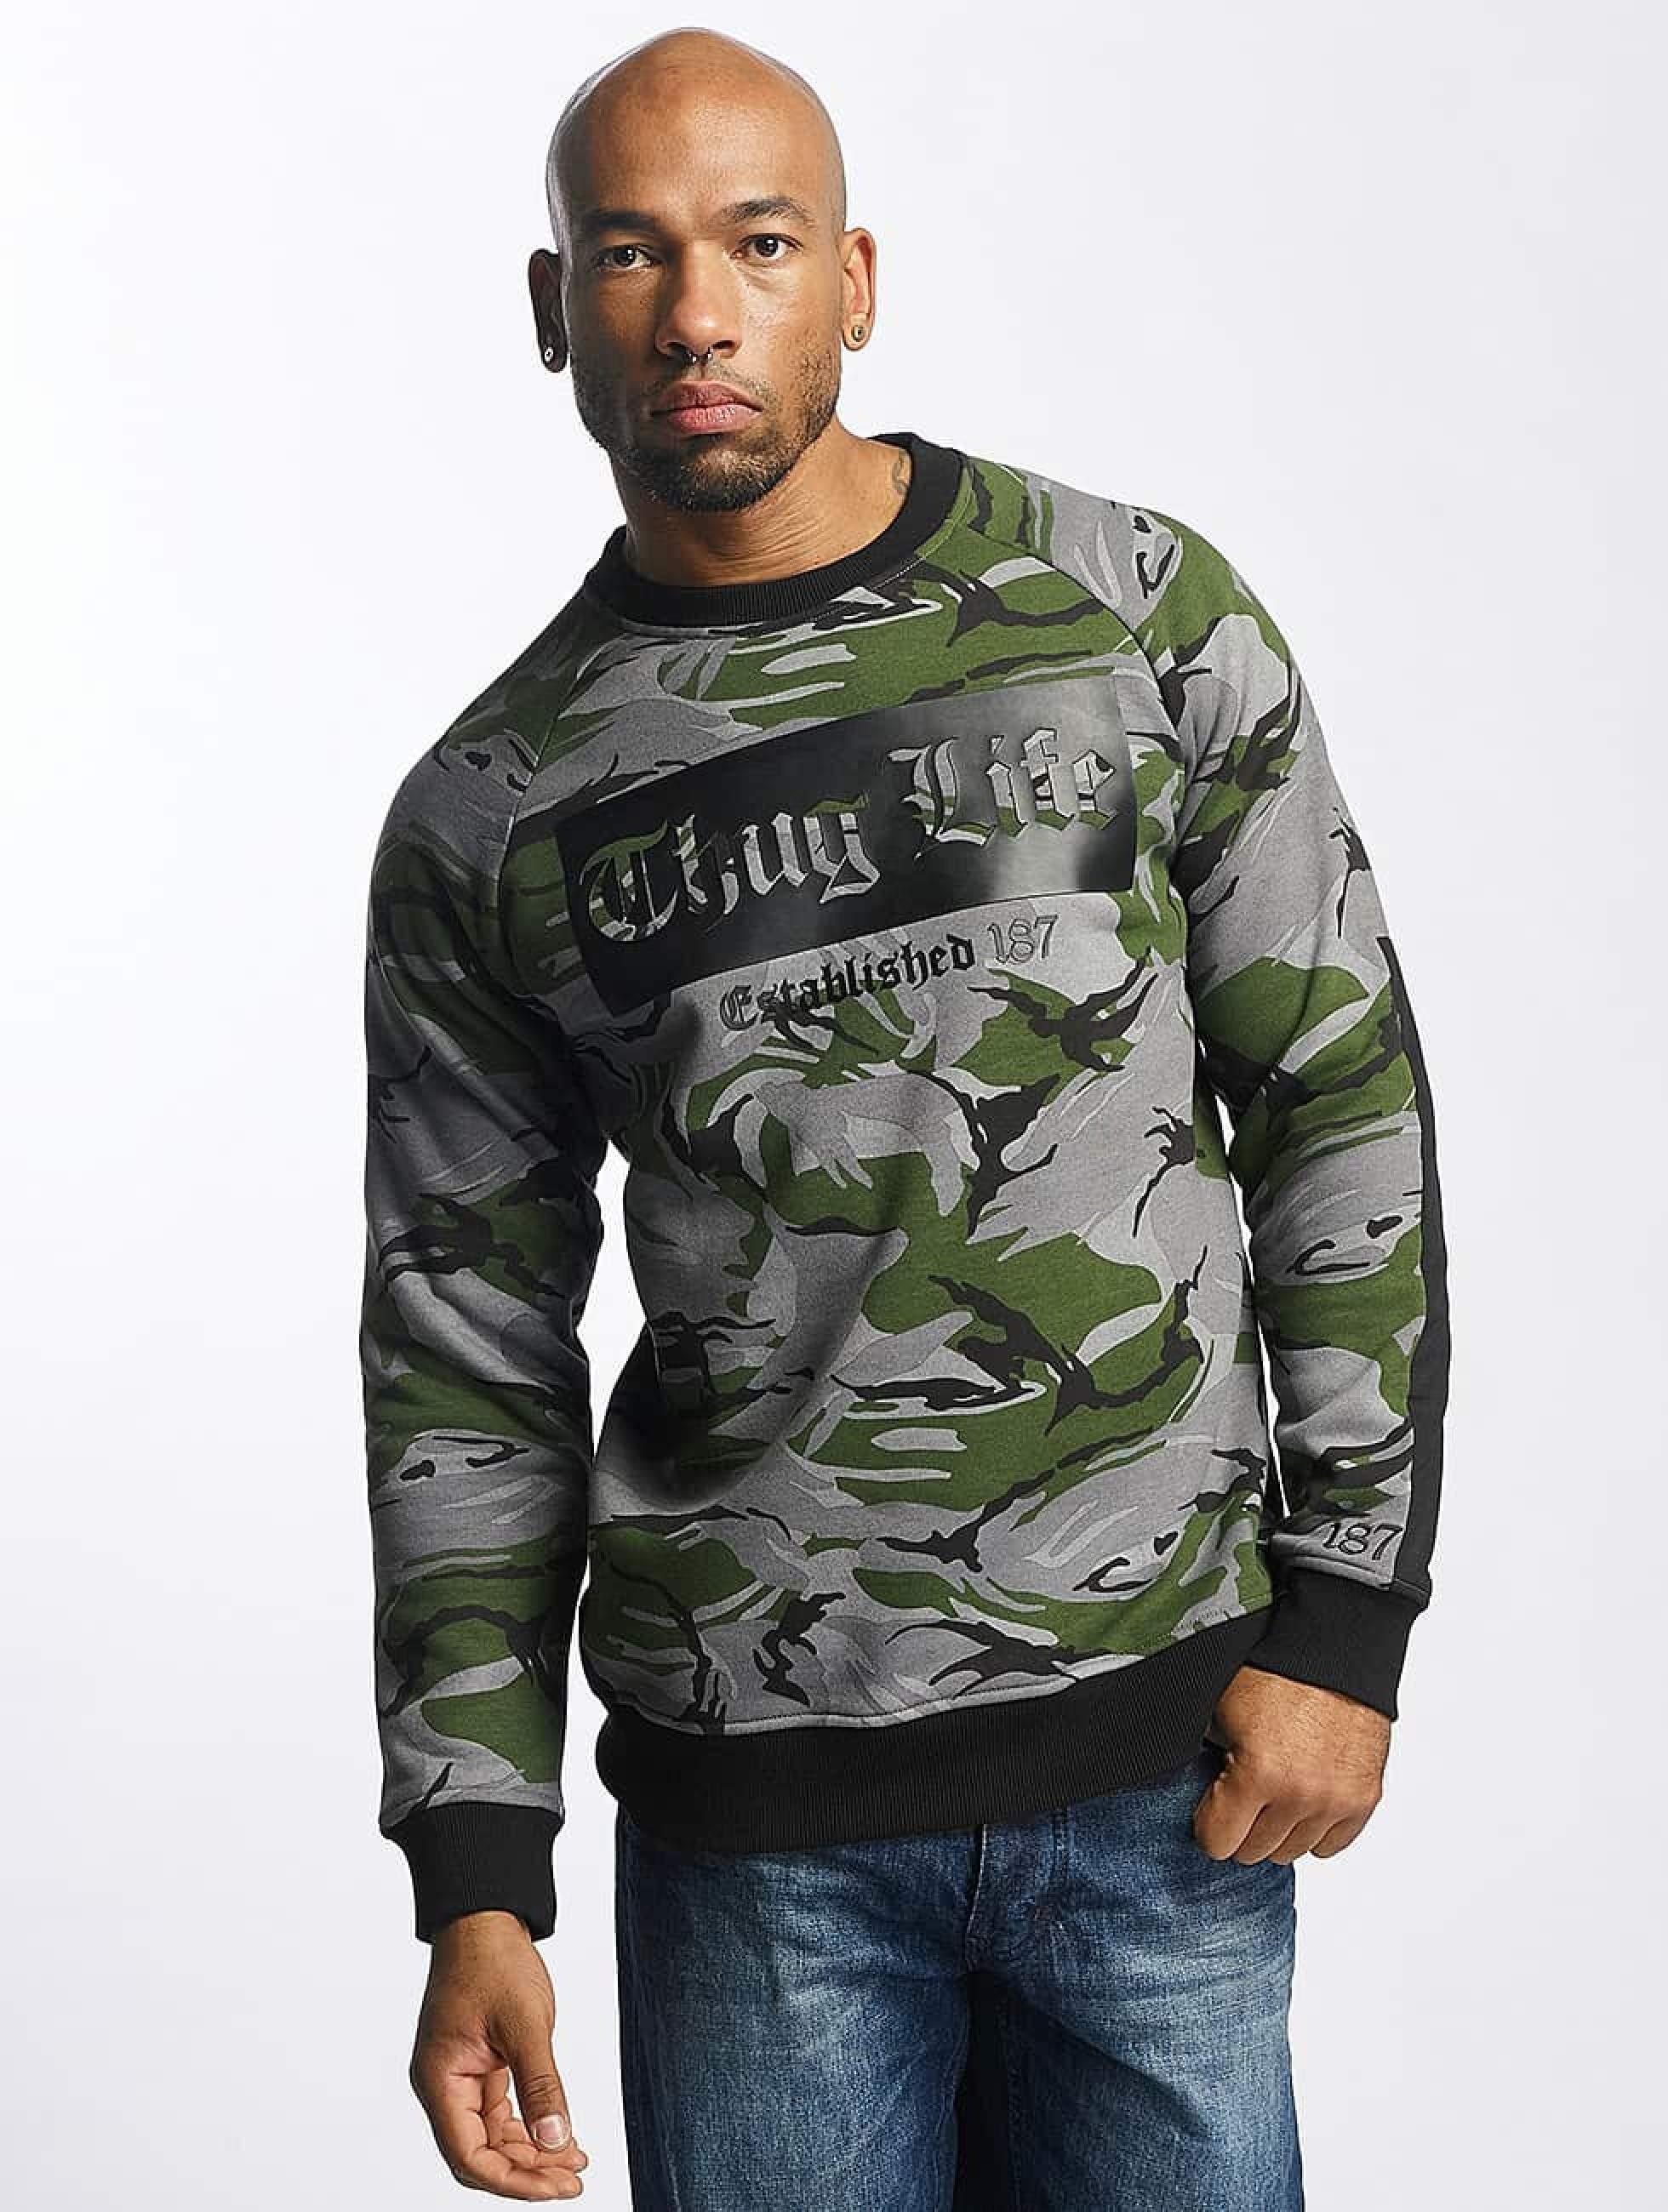 Thug Life / Jumper TLCN115 in camouflage 2XL